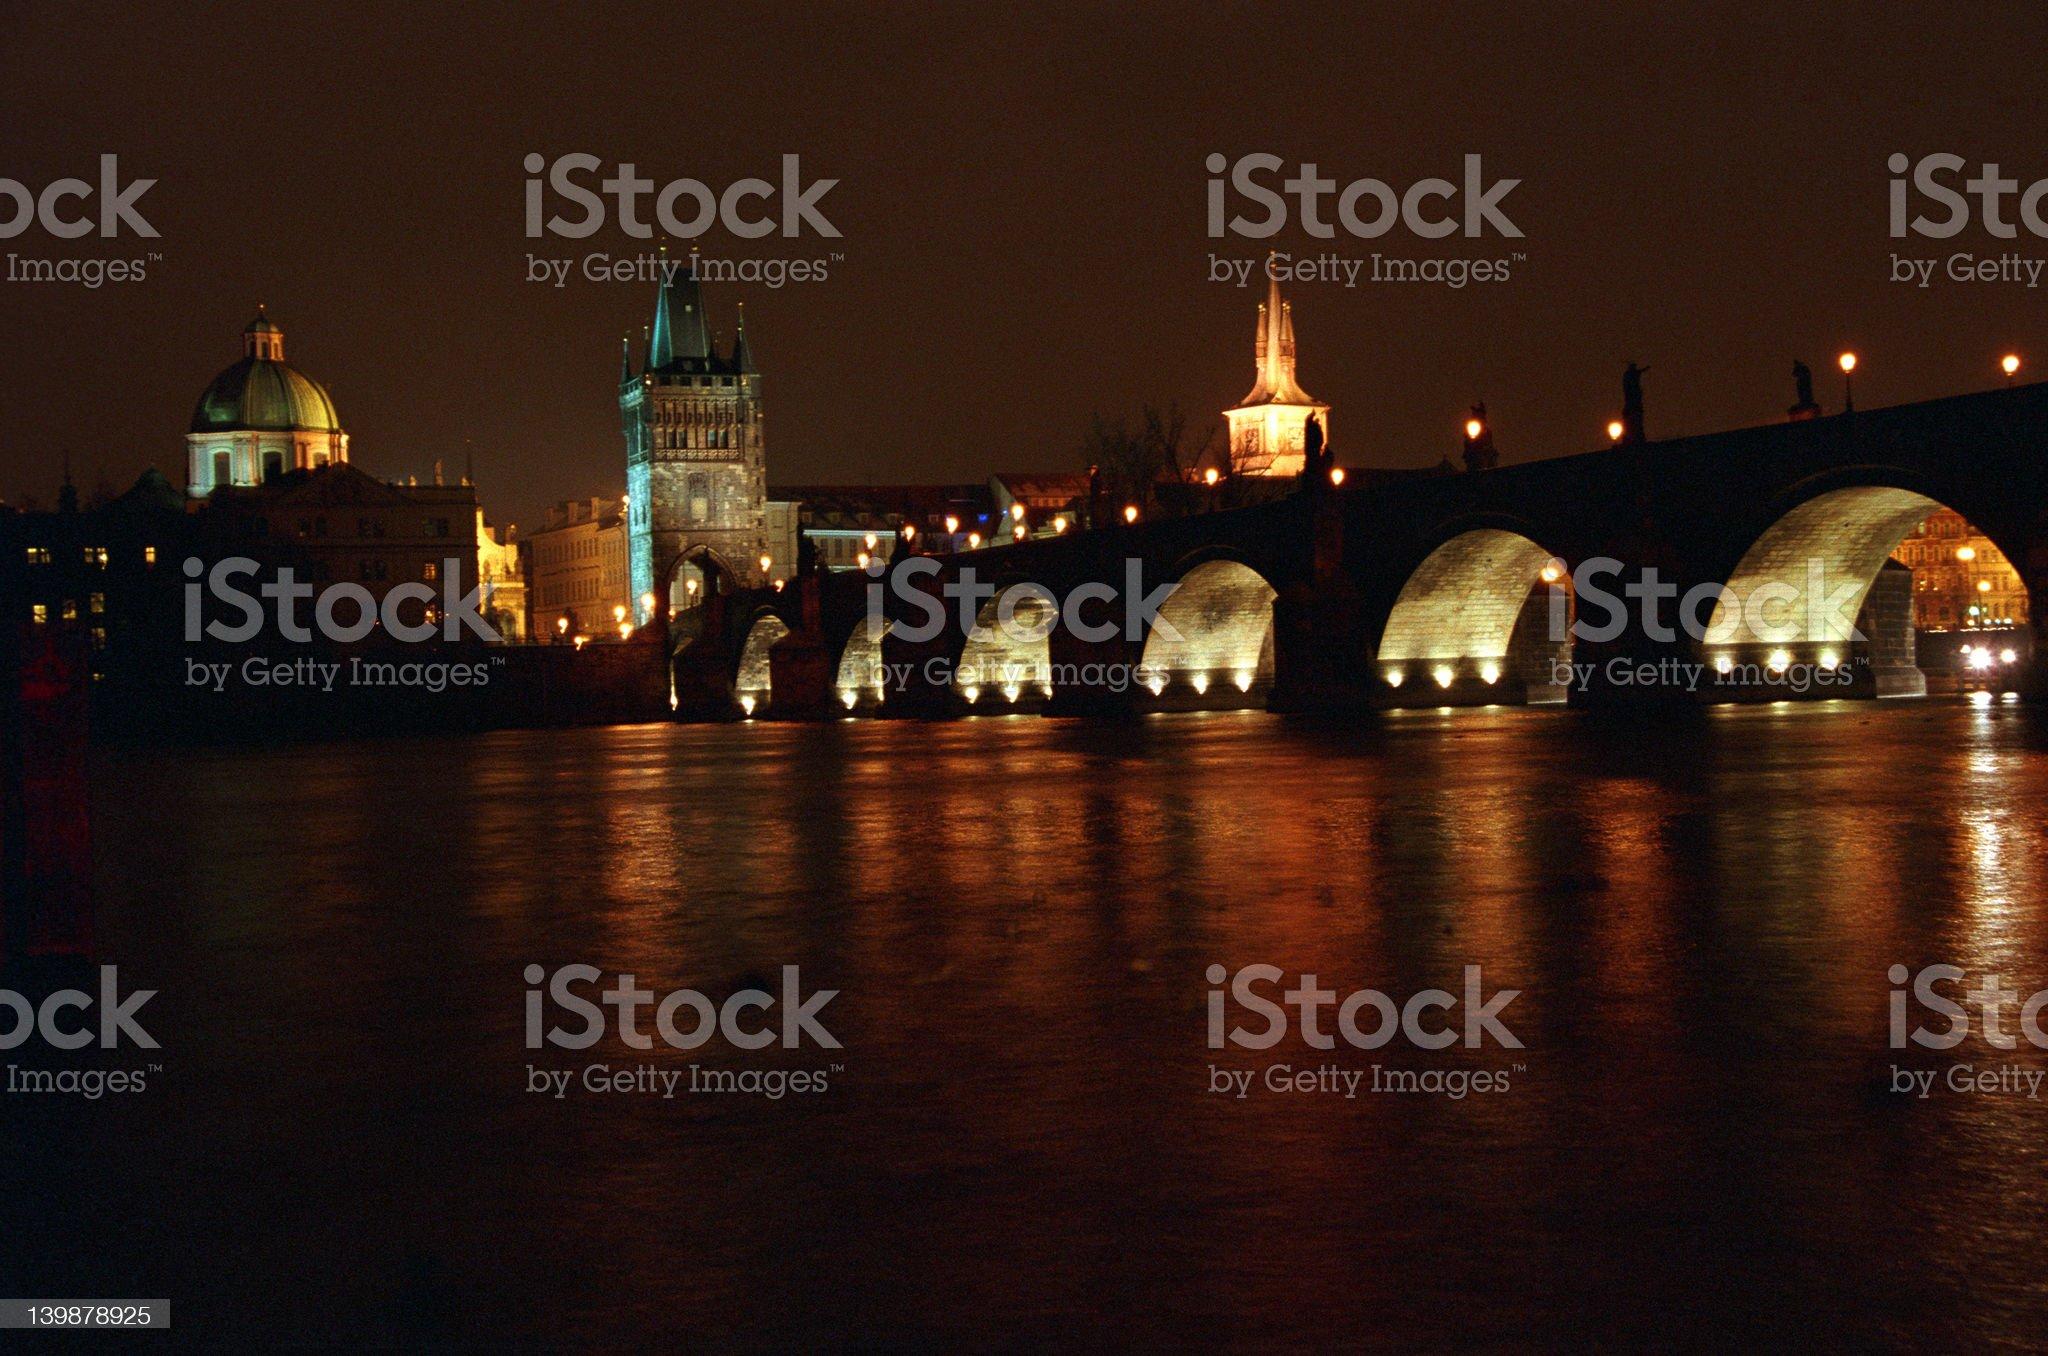 Carls bridge at night royalty-free stock photo